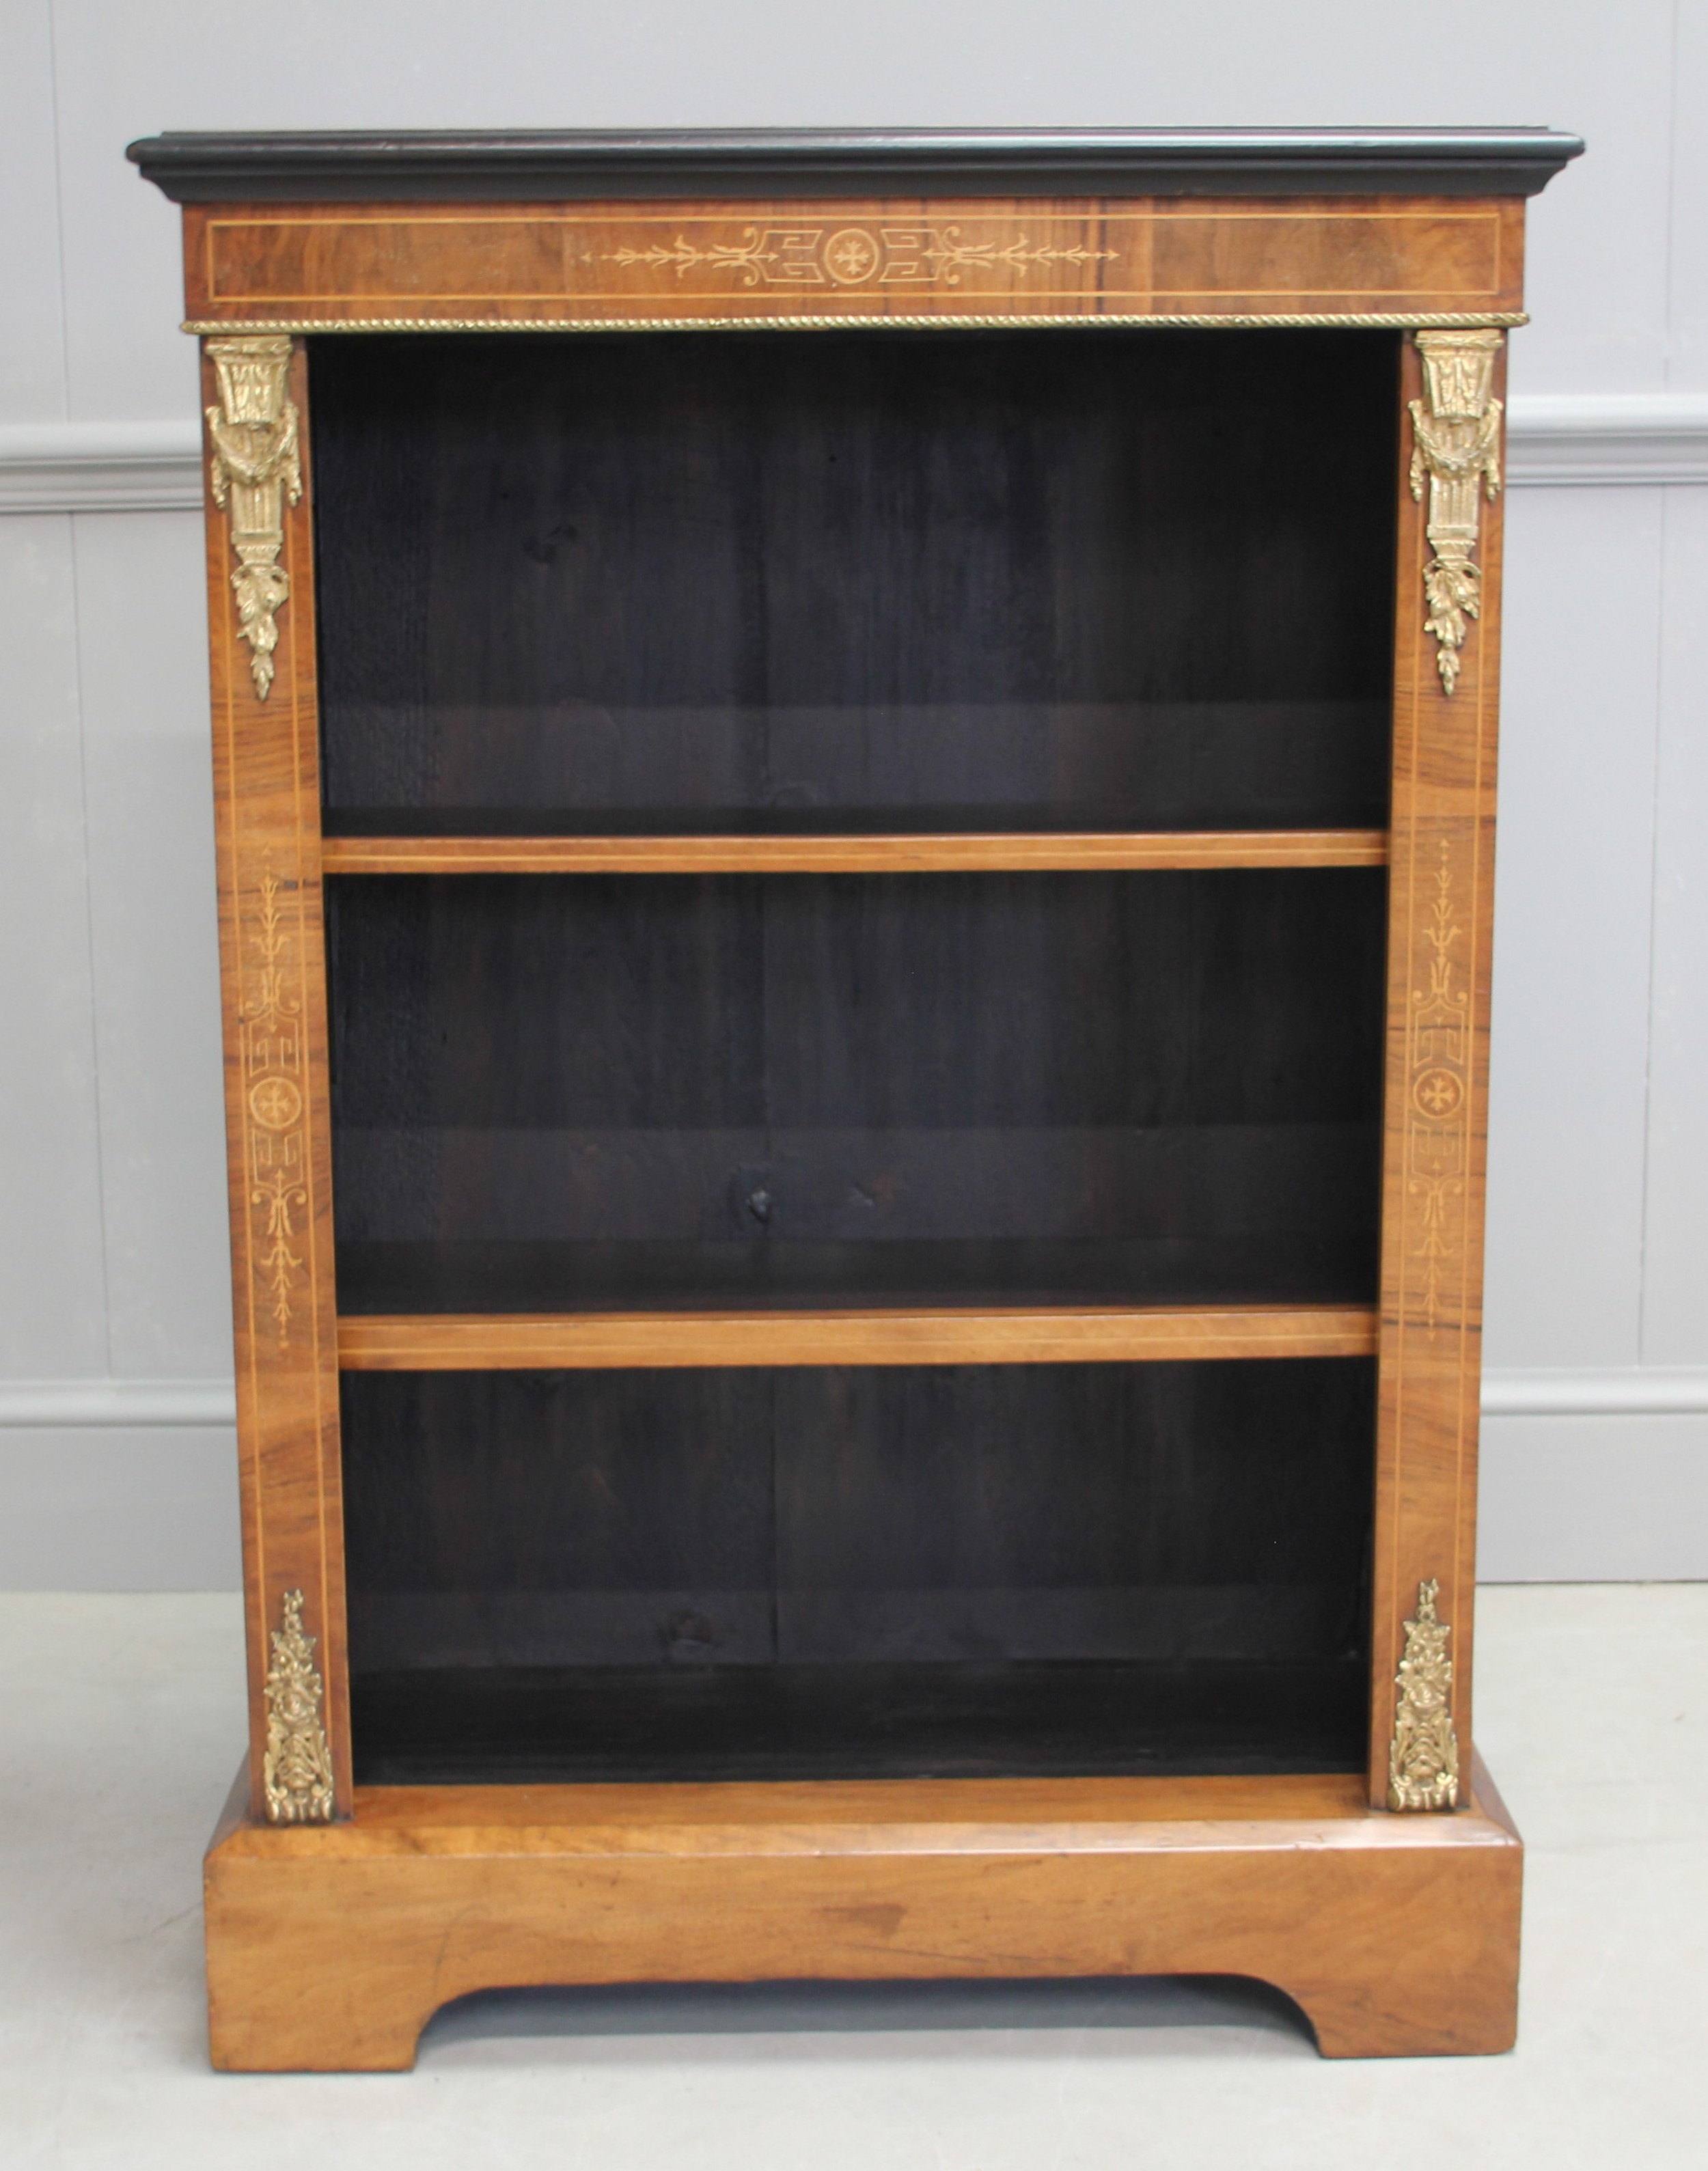 a 19th century walnut open bookcase